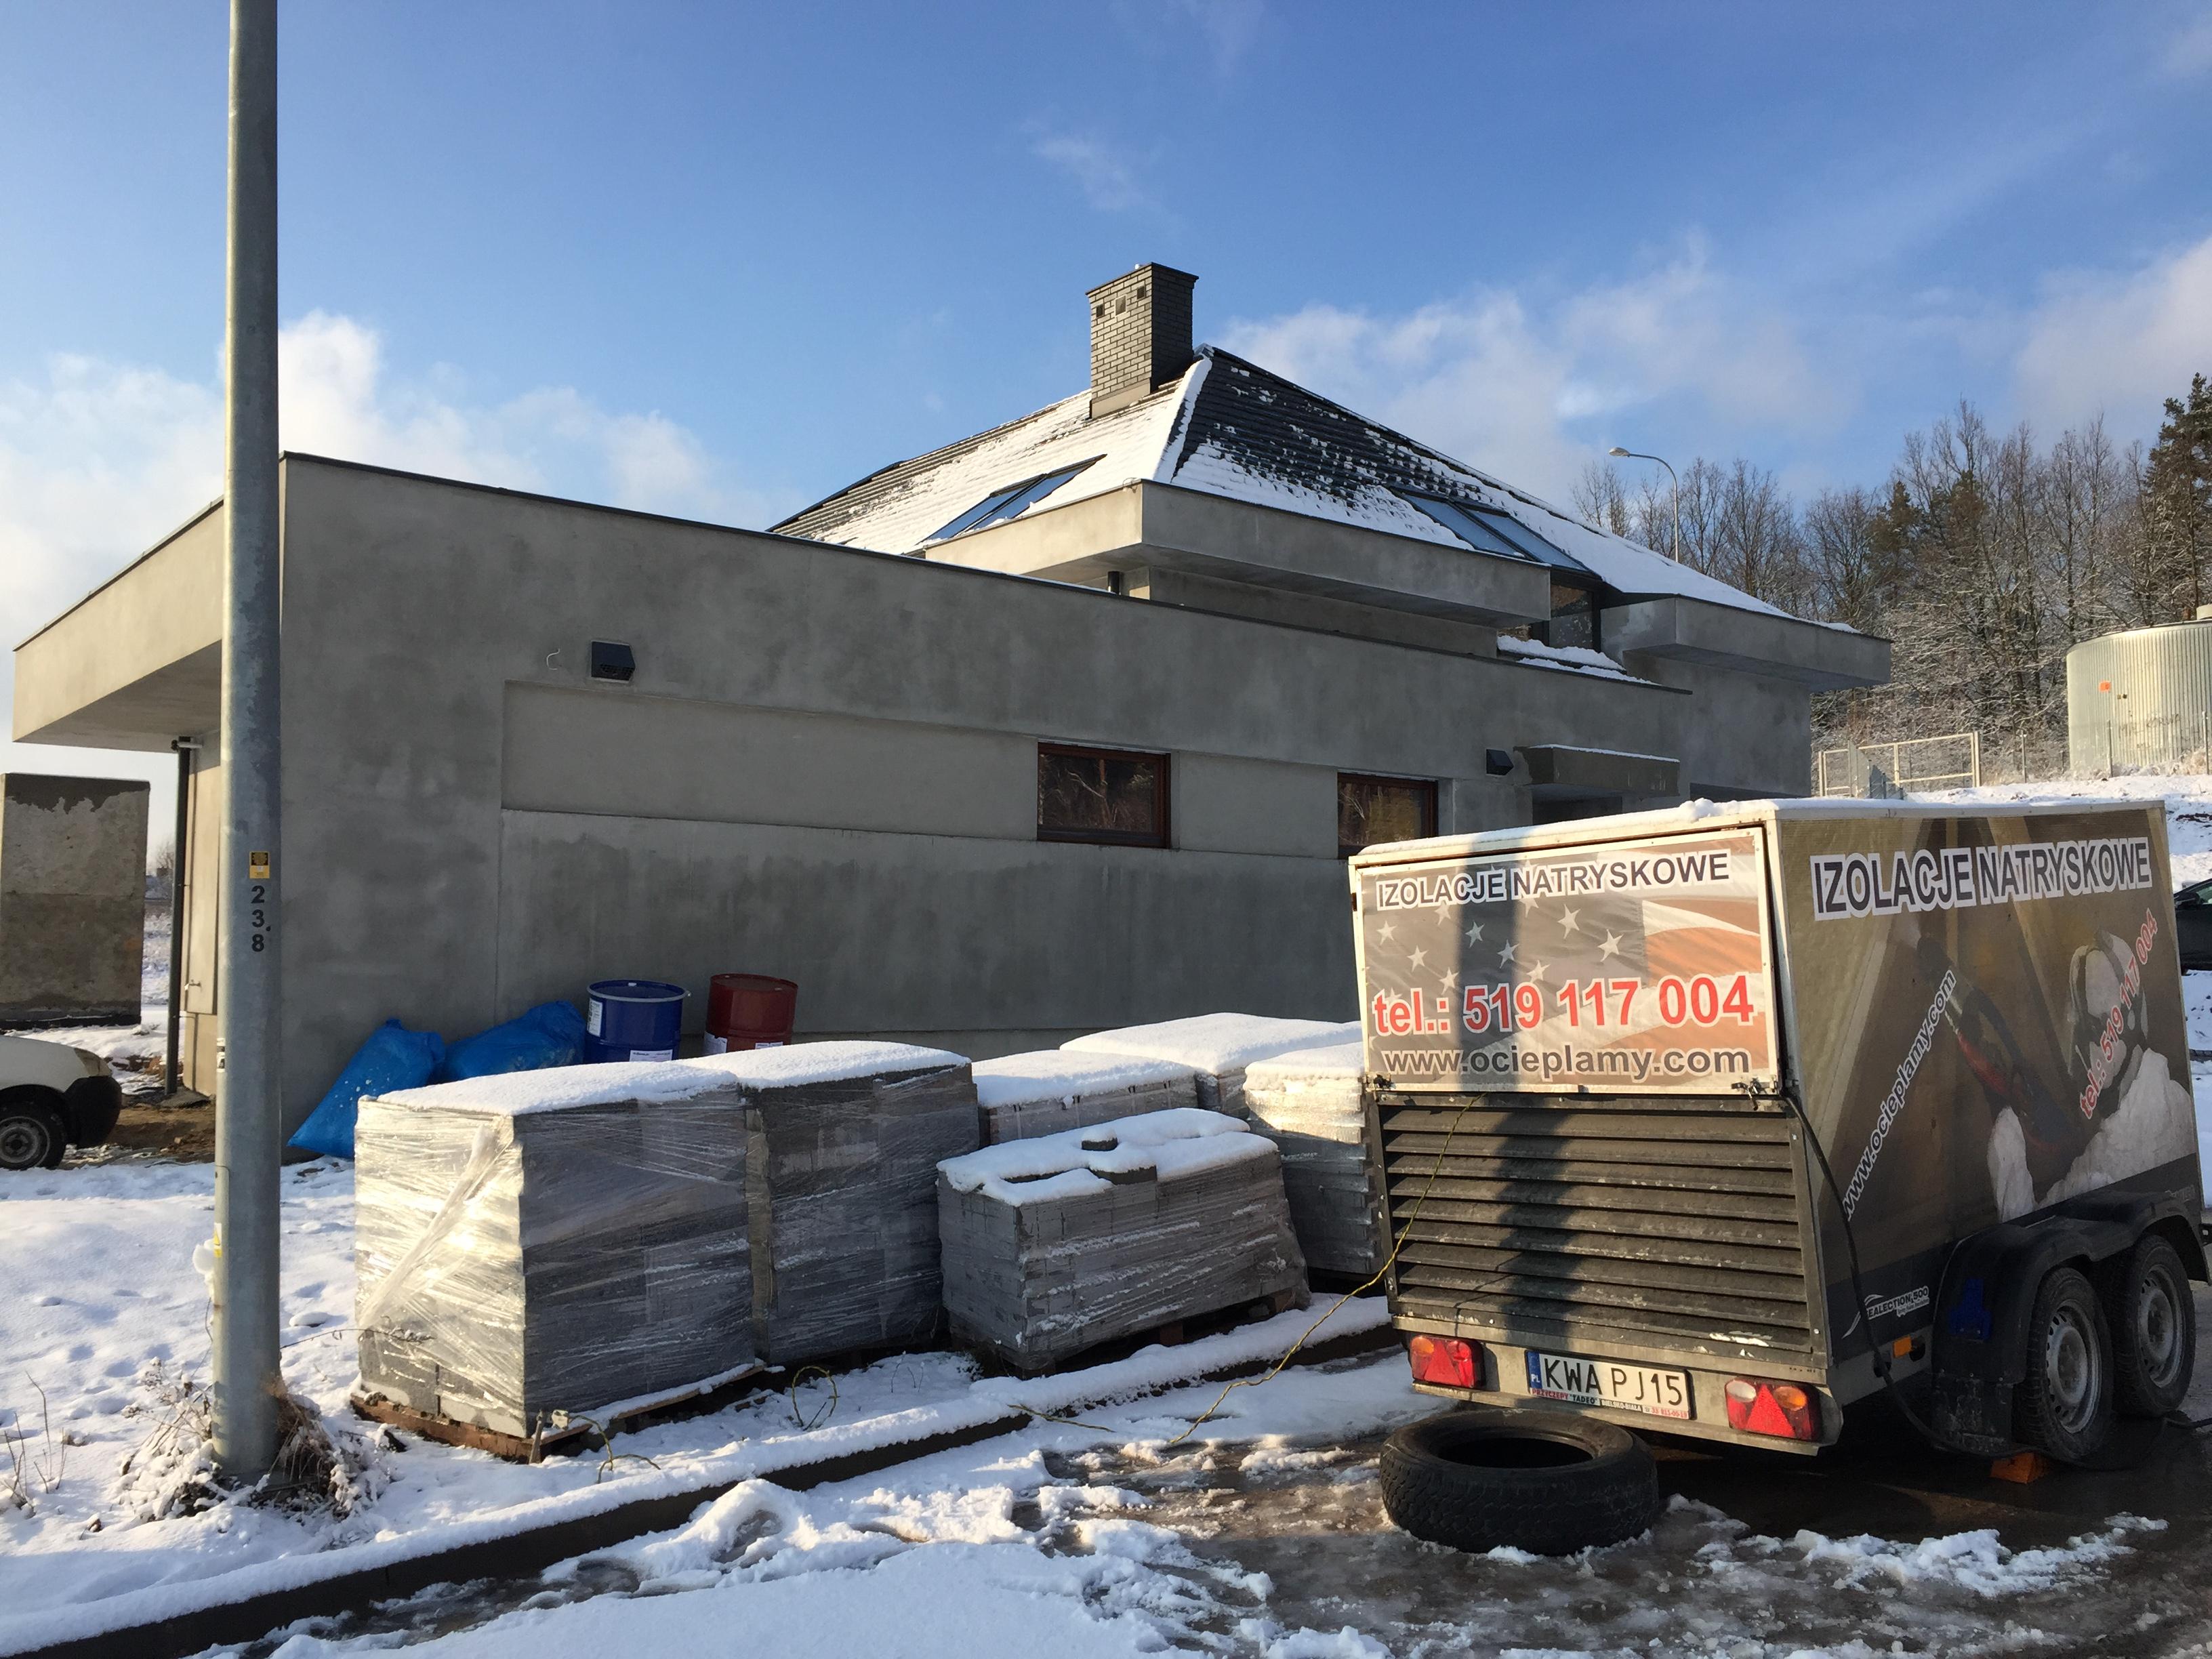 Ochrona cieplna budynku